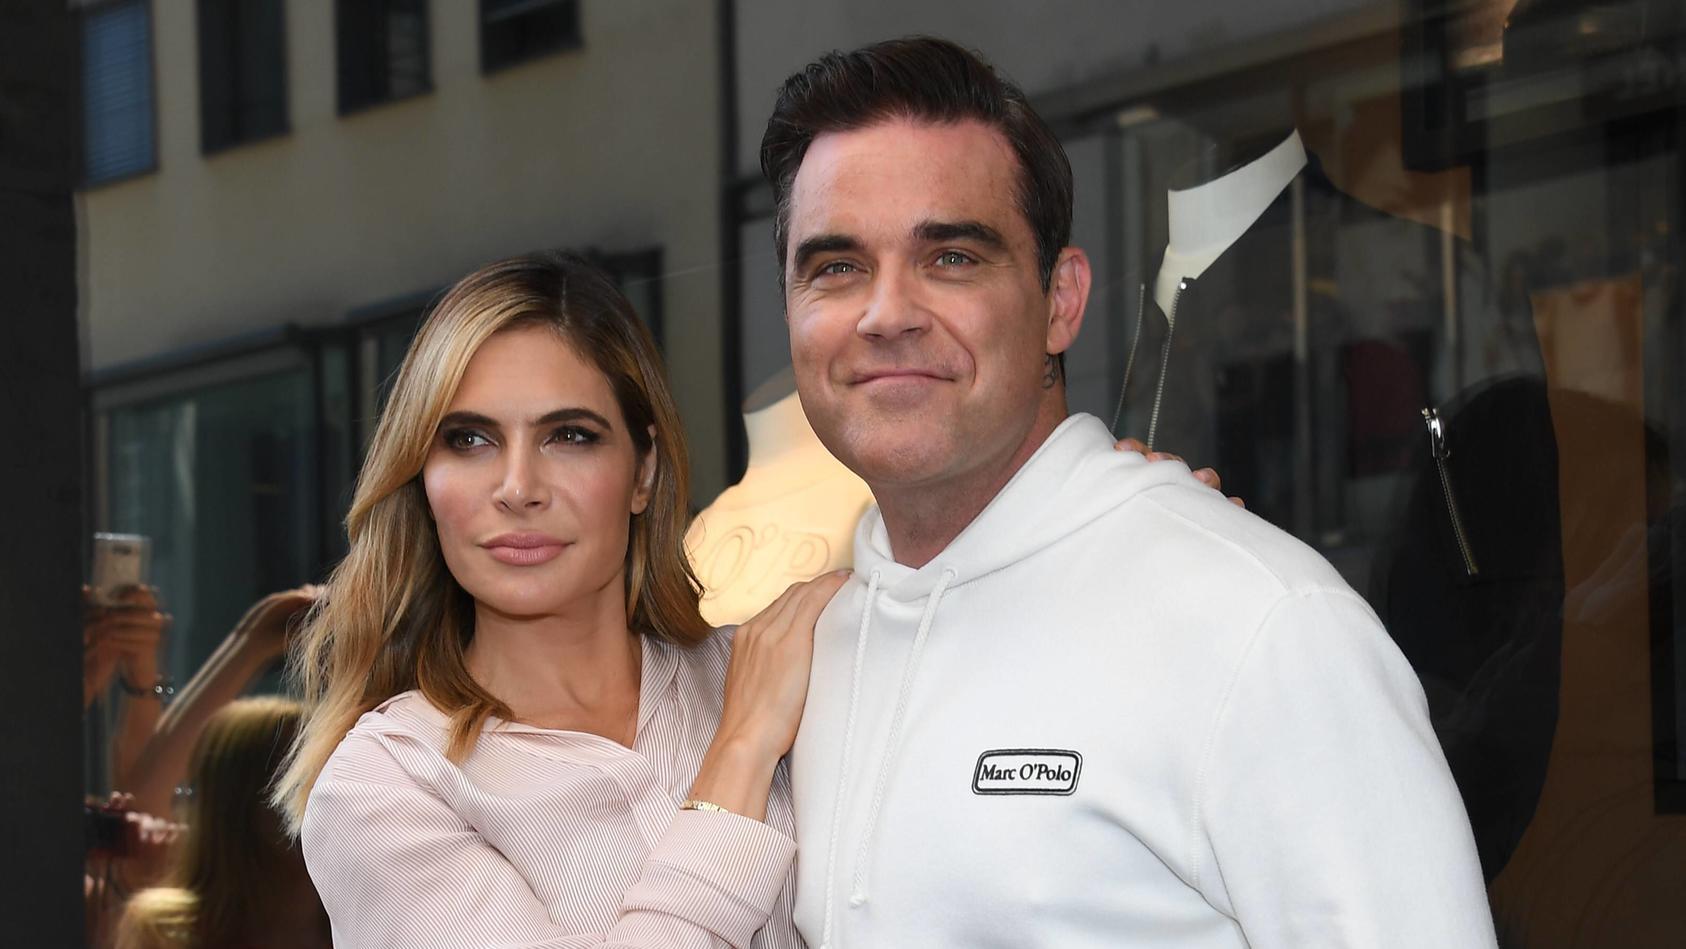 Bilder des Tages Robbie Williams mit Ehefrau Ayda Marc O«Polo Flagshipstore 5 Höfe München